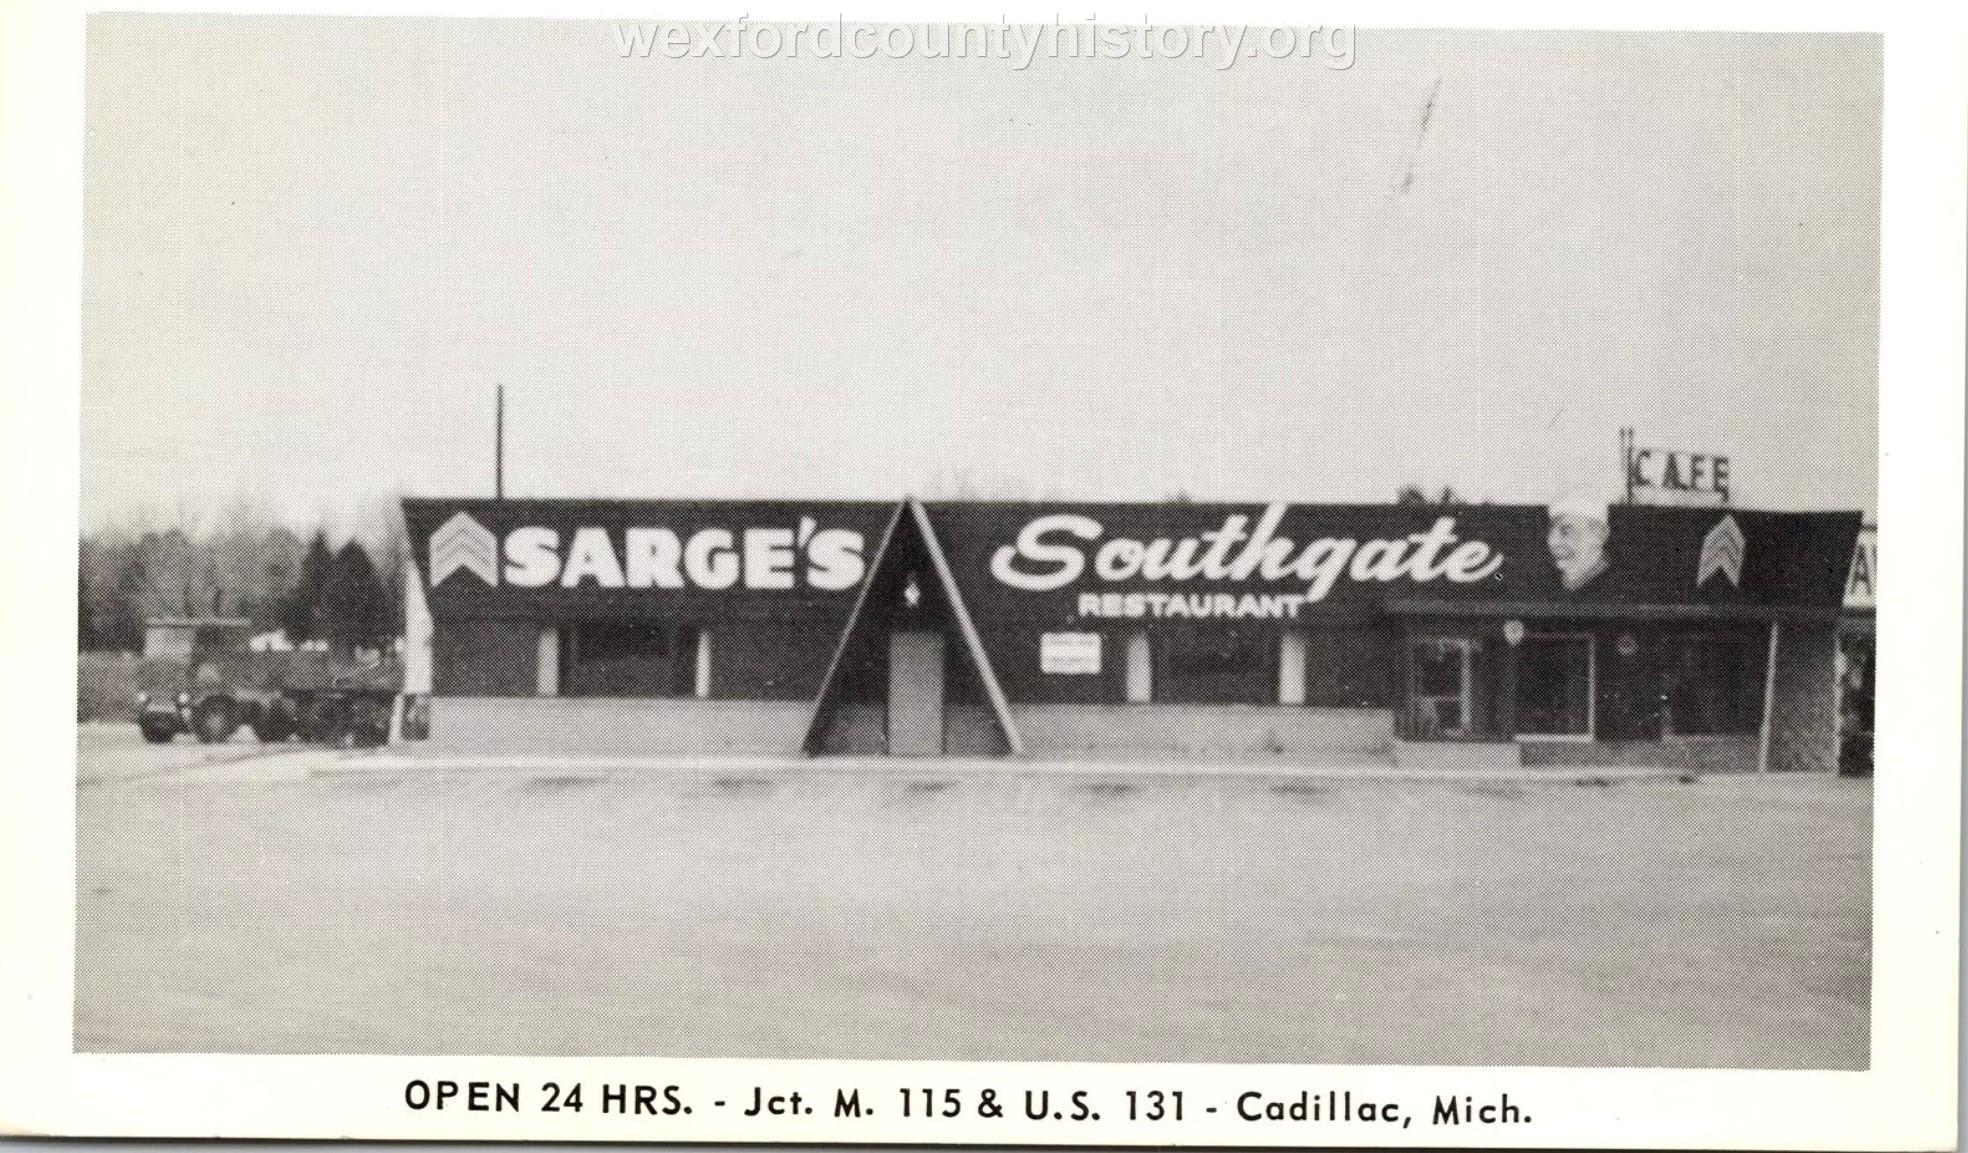 Southgate Restaurant